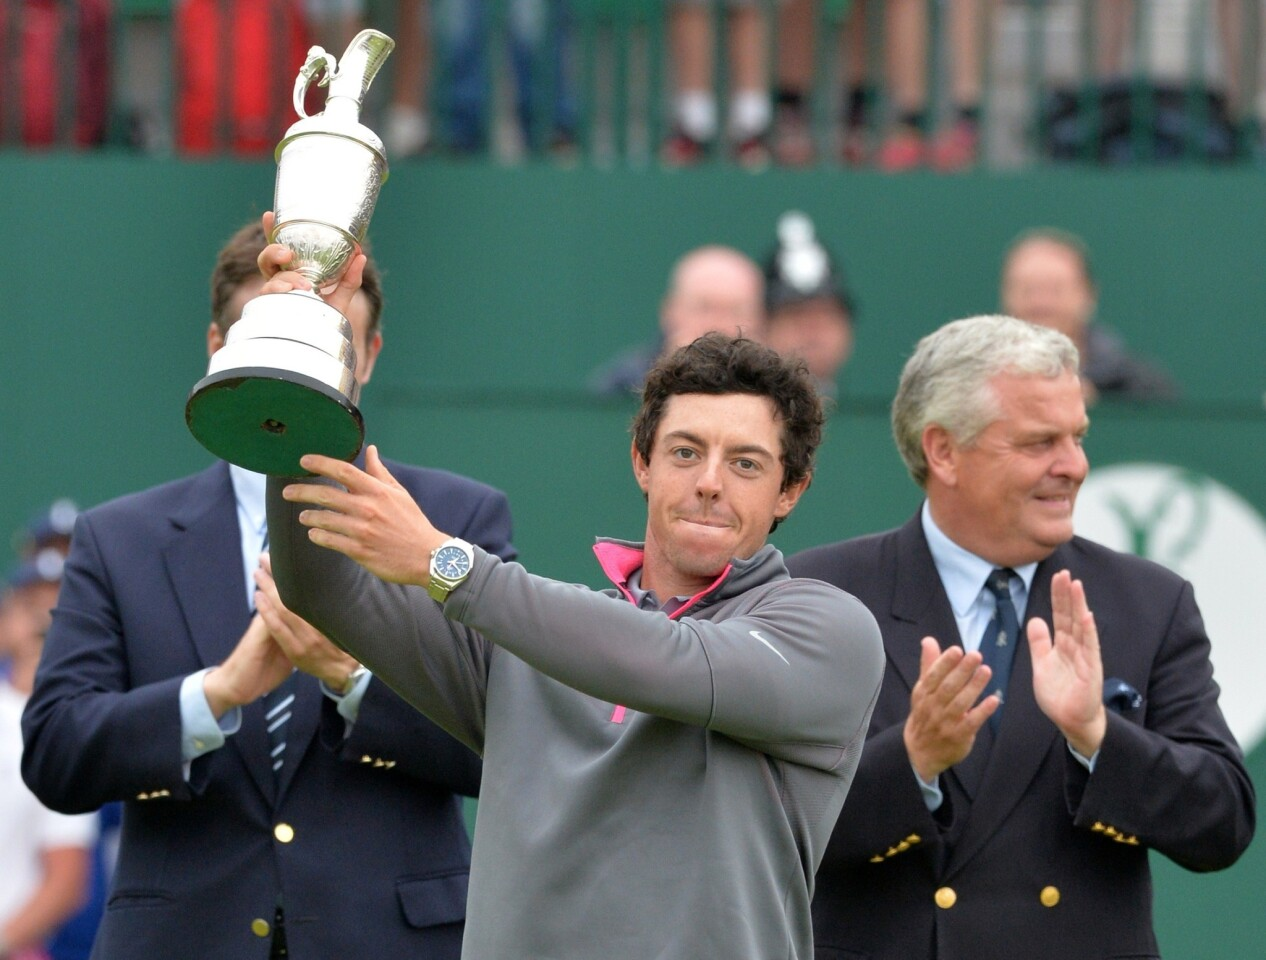 143rd Open Championship